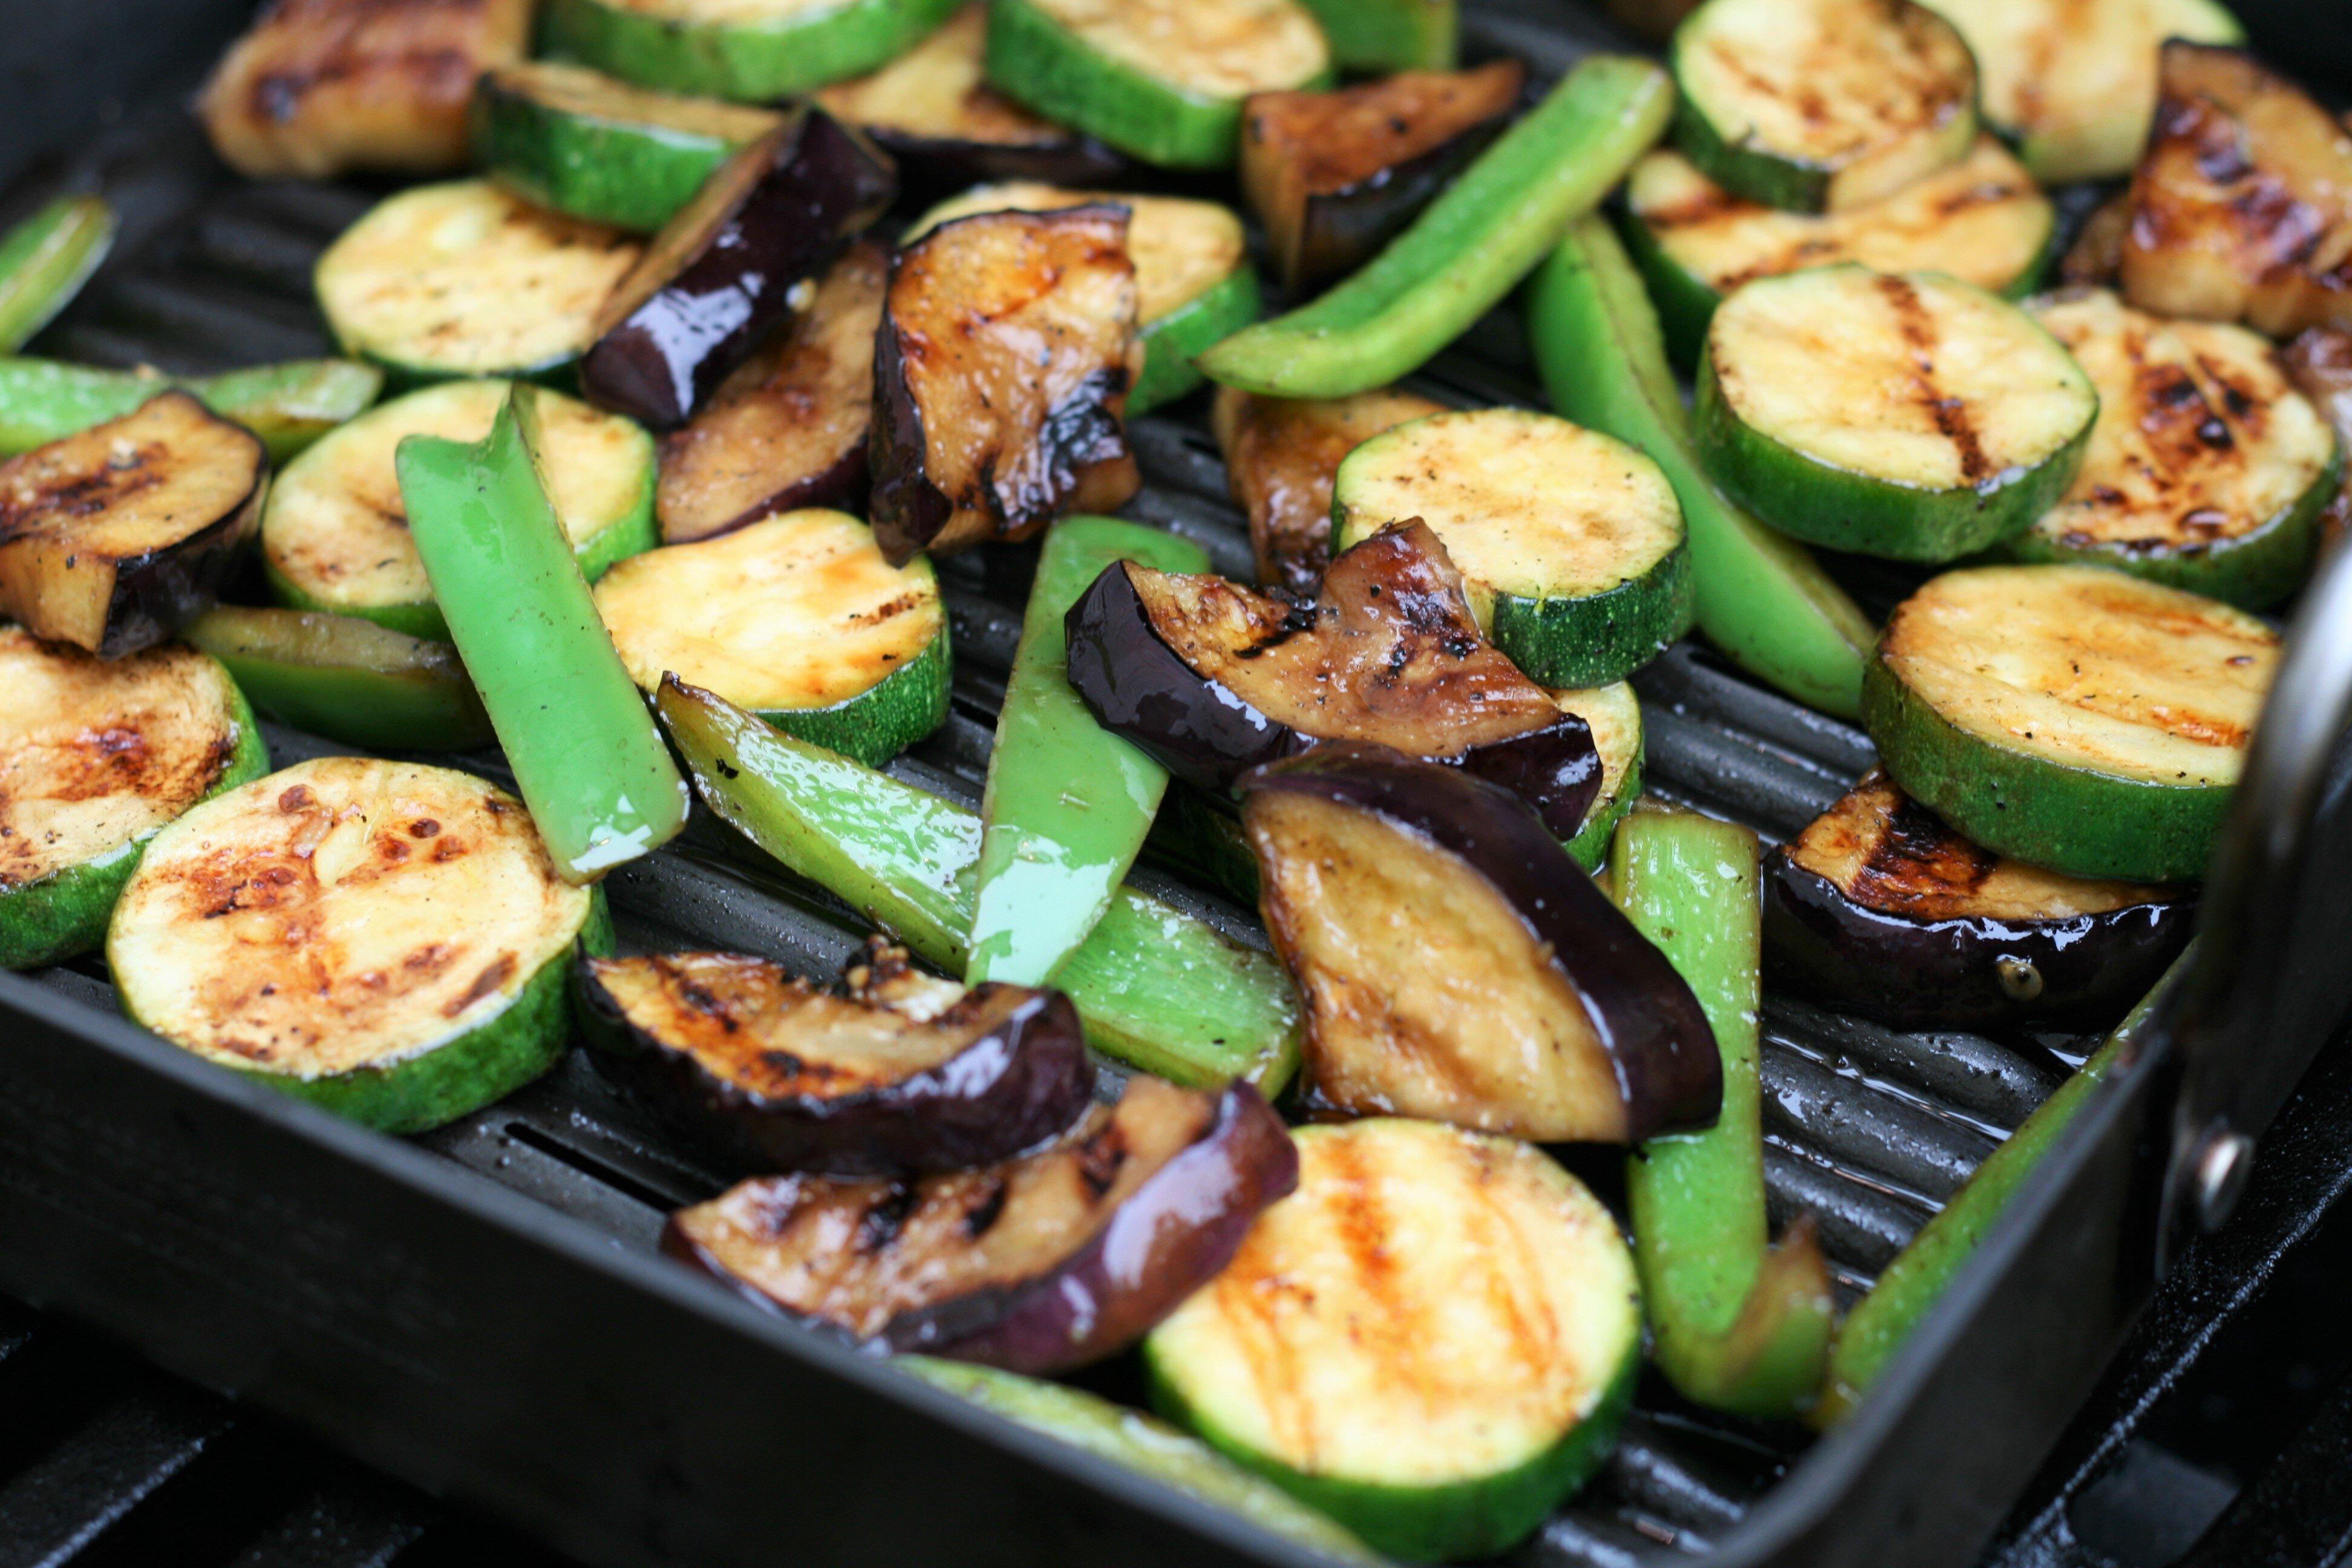 grilled vegetables with balsamic vinegar